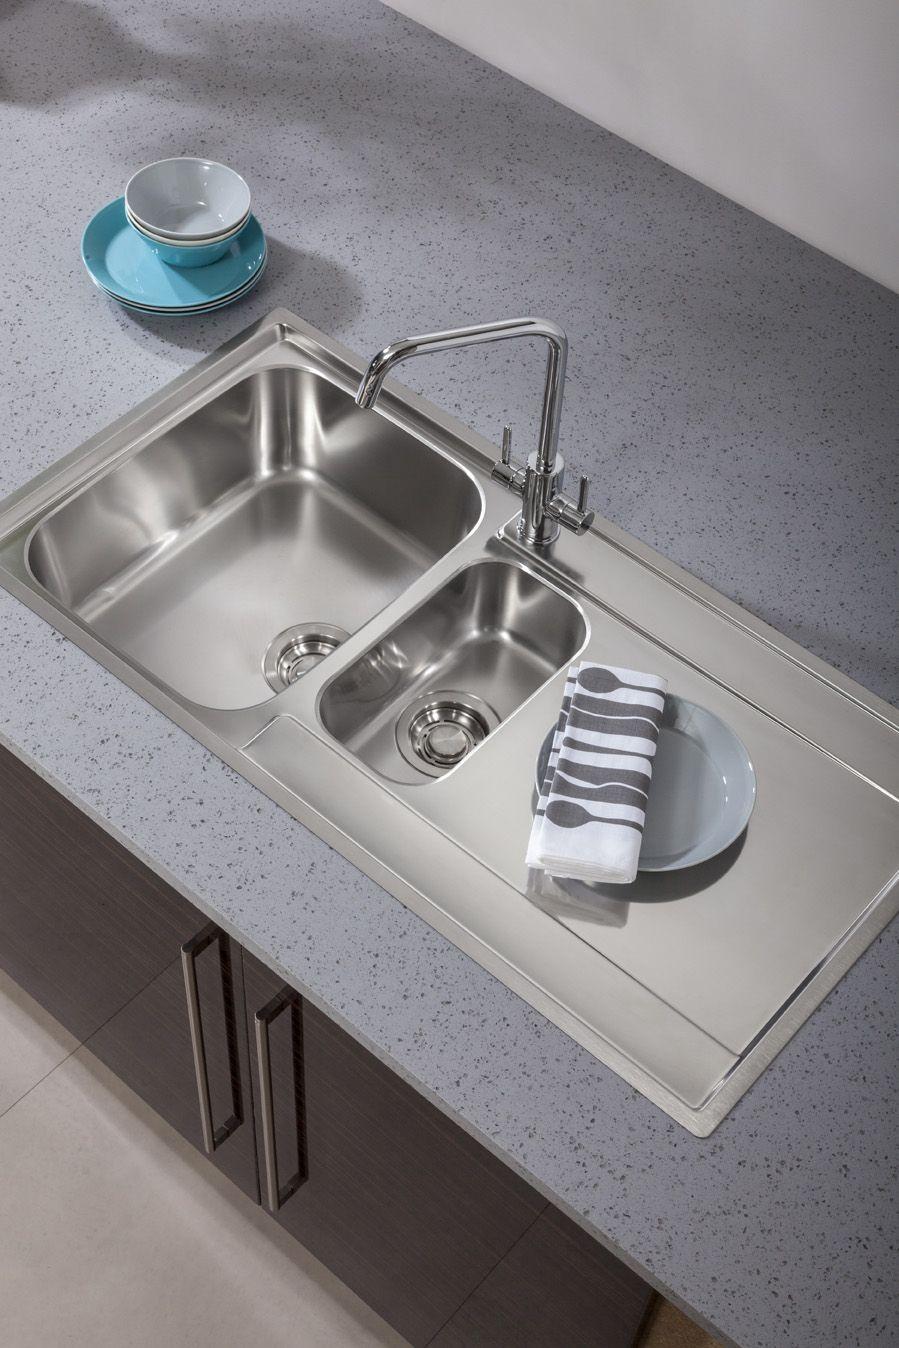 Franke Maris Slimtop Sink And Maris Tap In Chrome Franke Kitchen Sink Kitchen Design